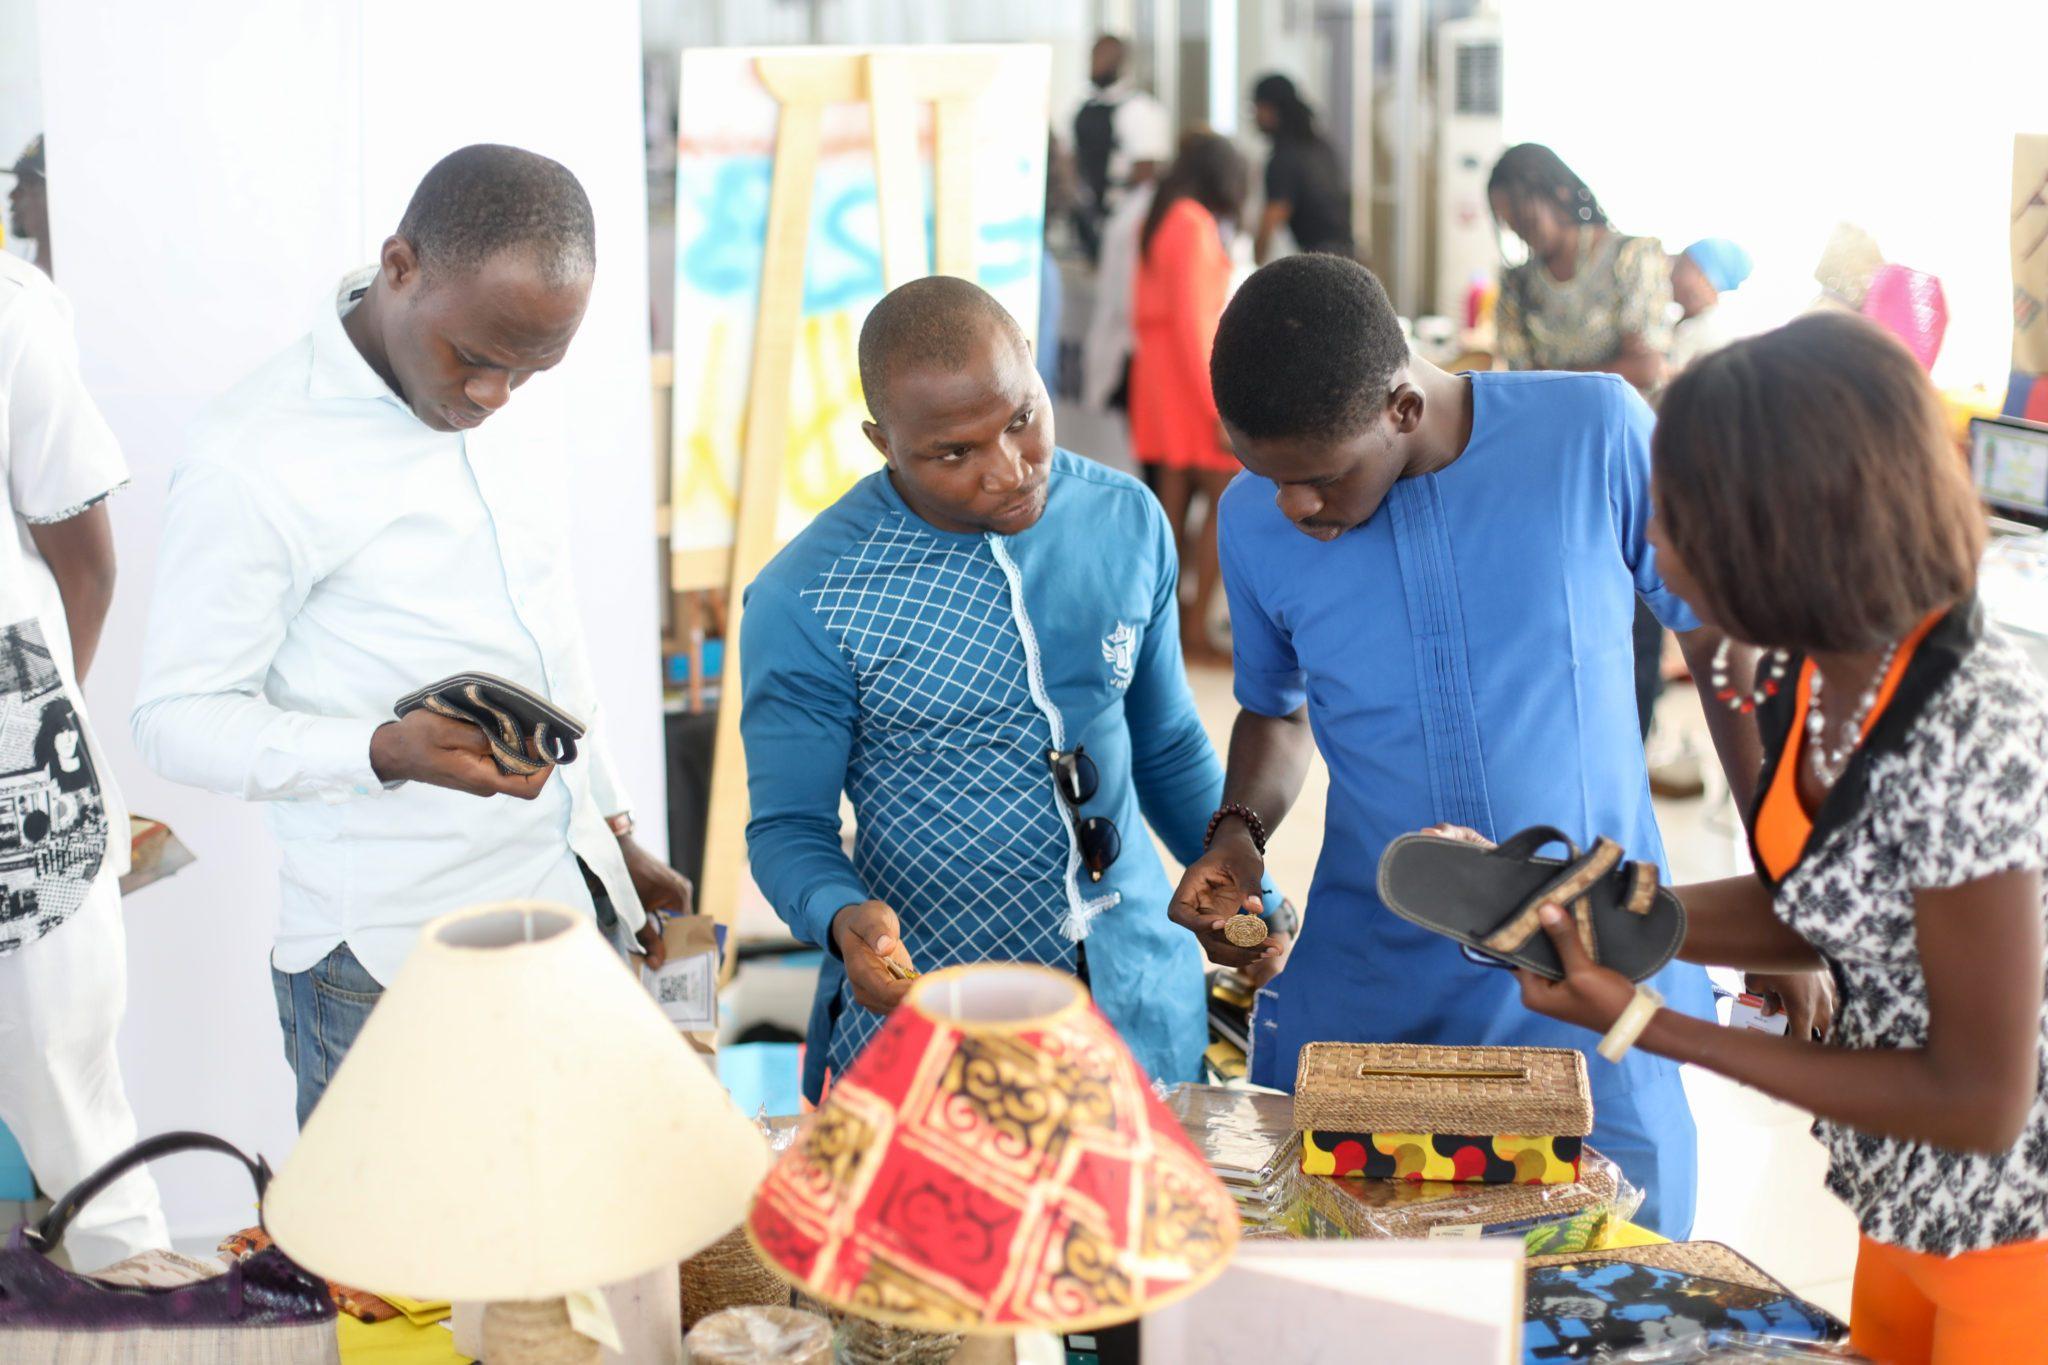 Enterpreneur tasks FG on effective policies to encourage SMEs